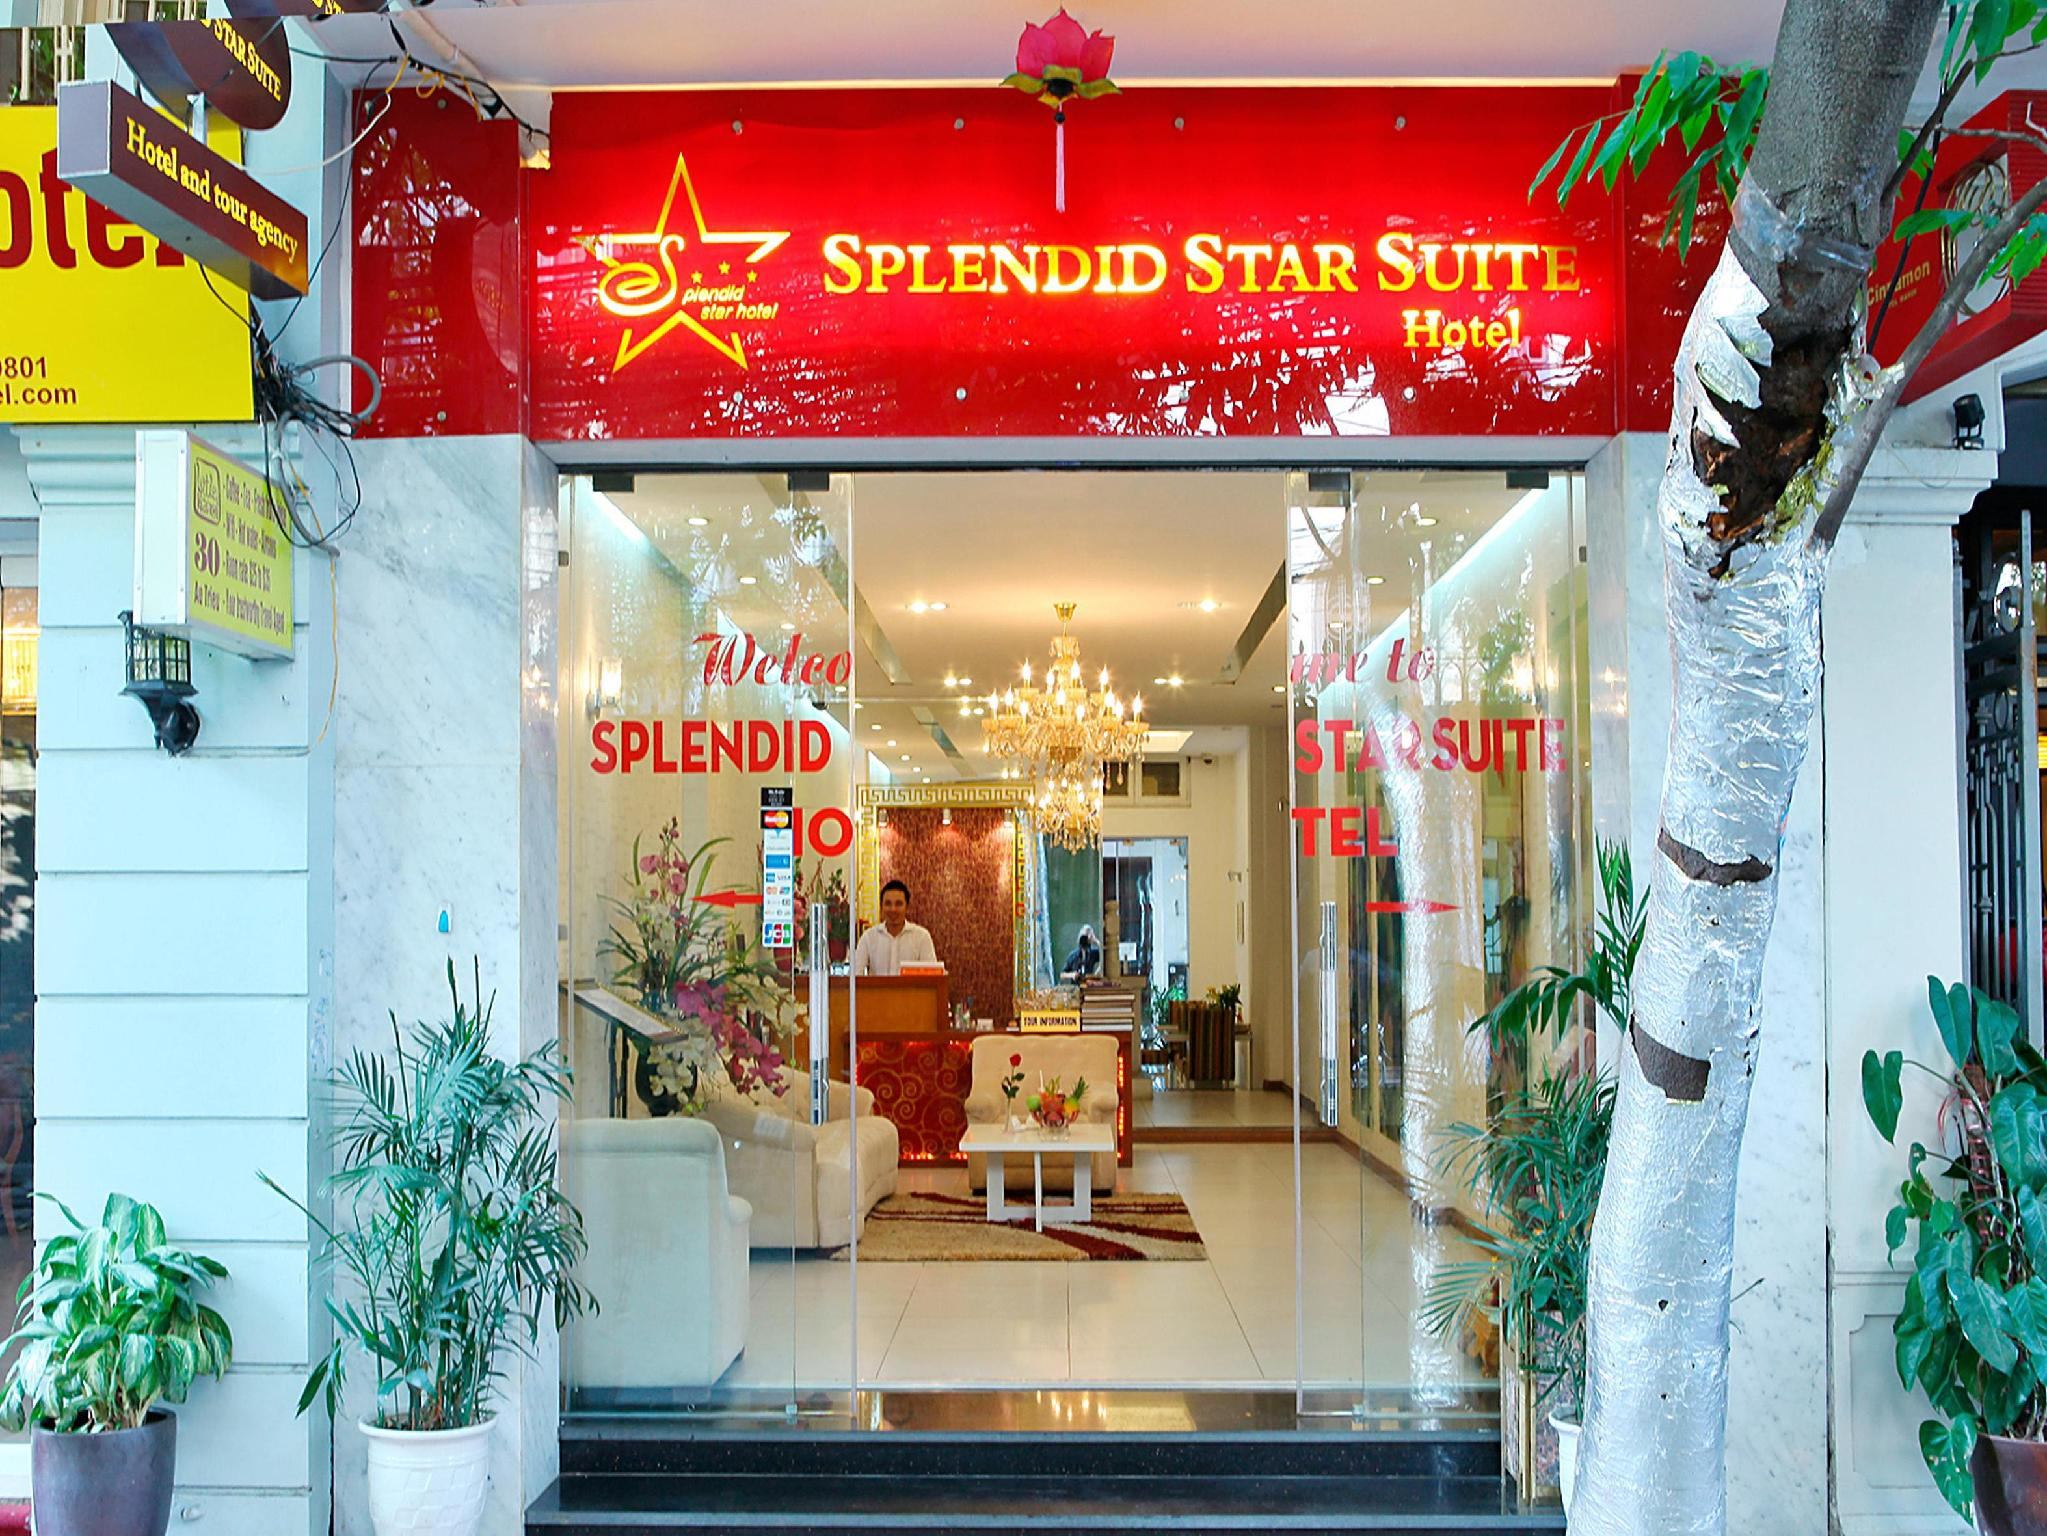 Splendid Star Suite Hotel - Hotell och Boende i Vietnam , Hanoi